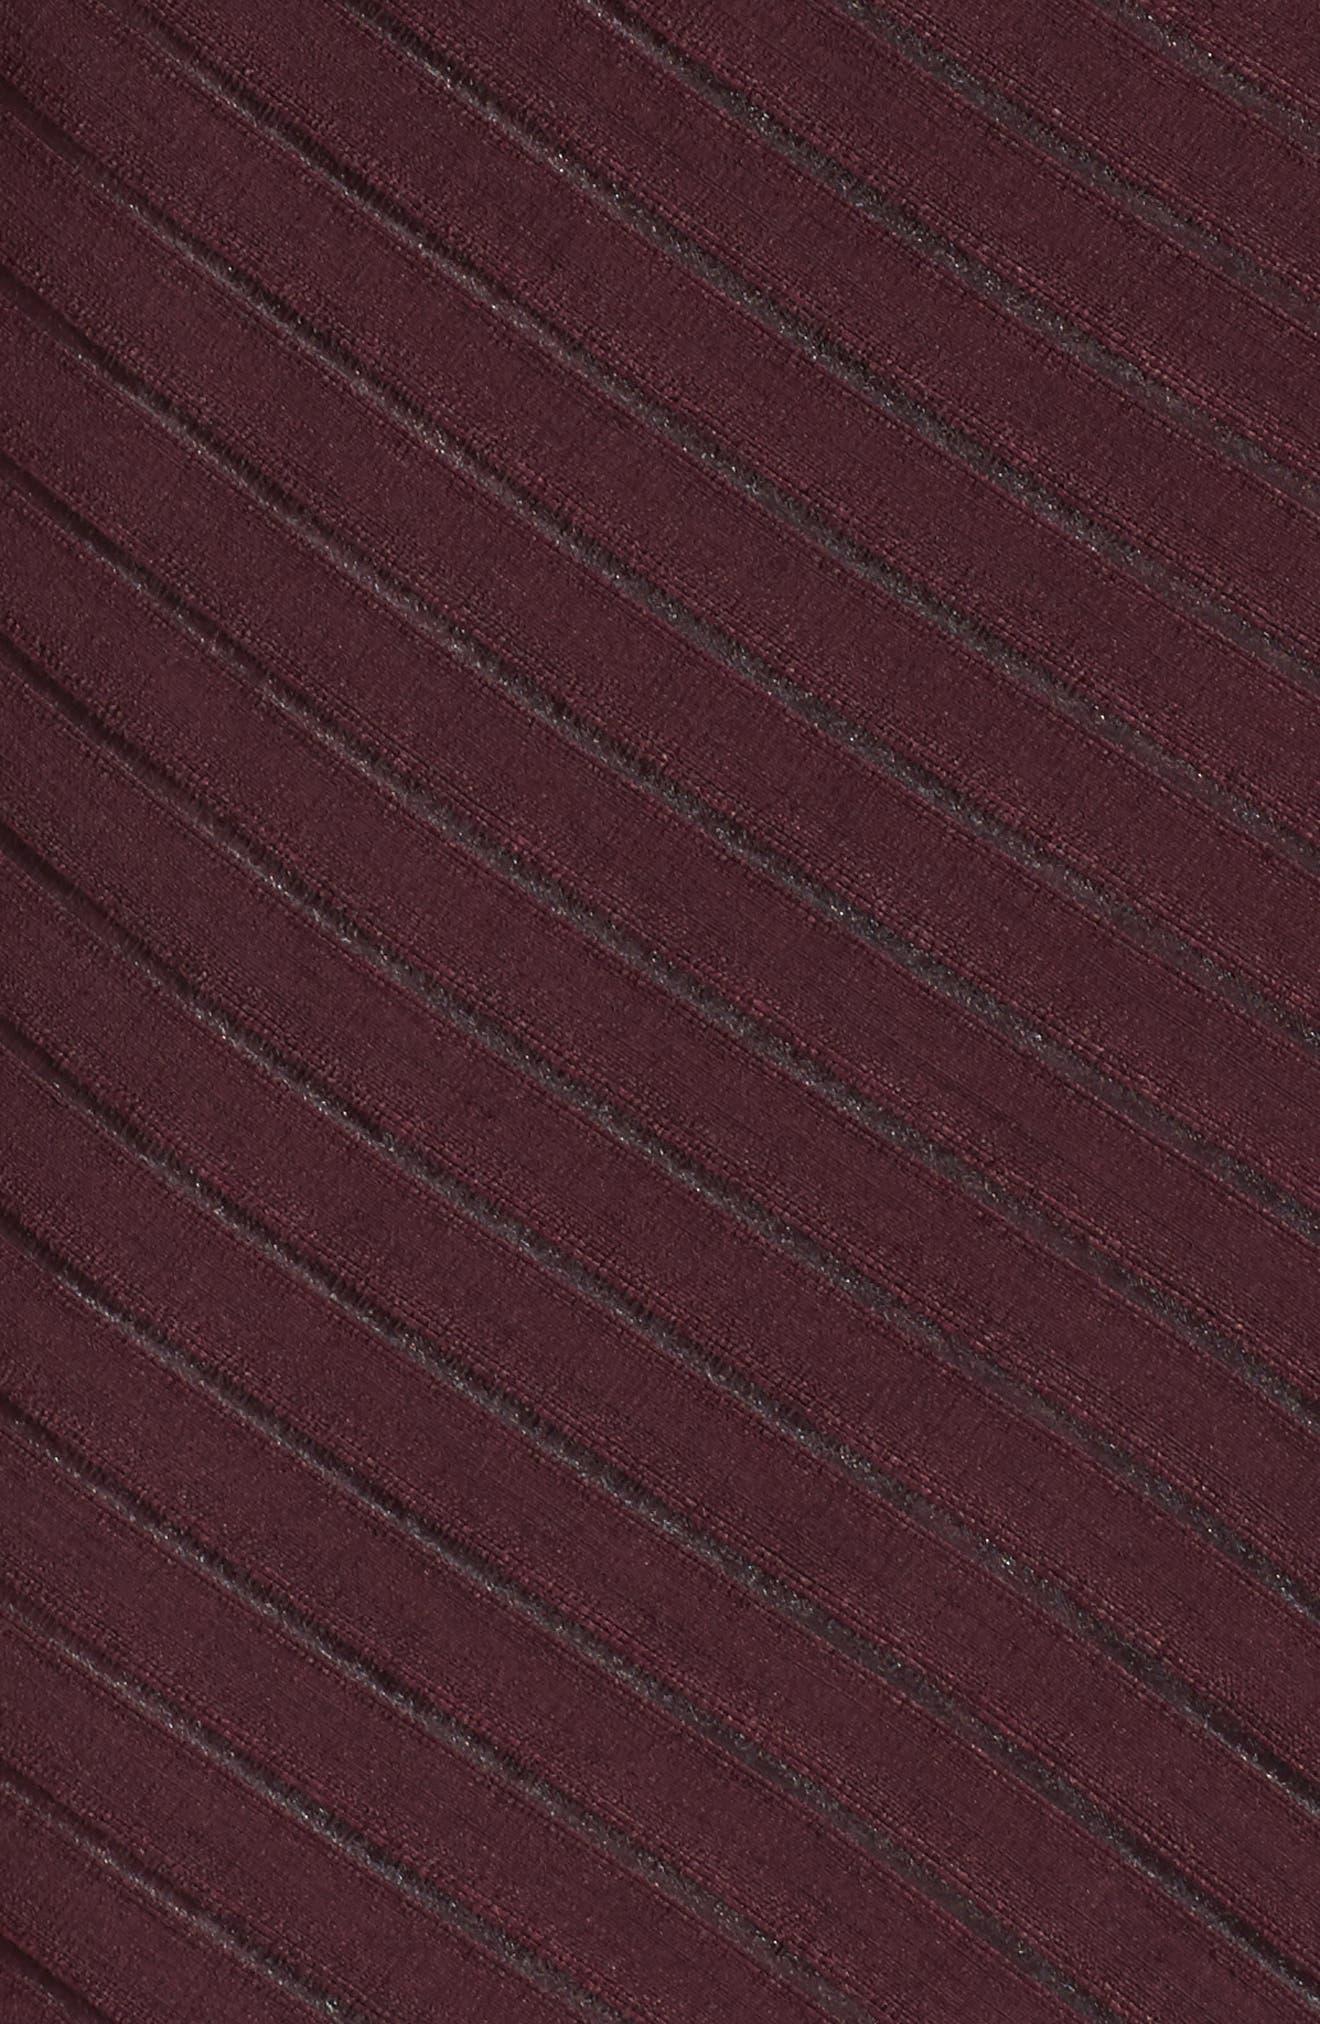 Shadow Stripe Wrap Dress,                             Alternate thumbnail 5, color,                             930